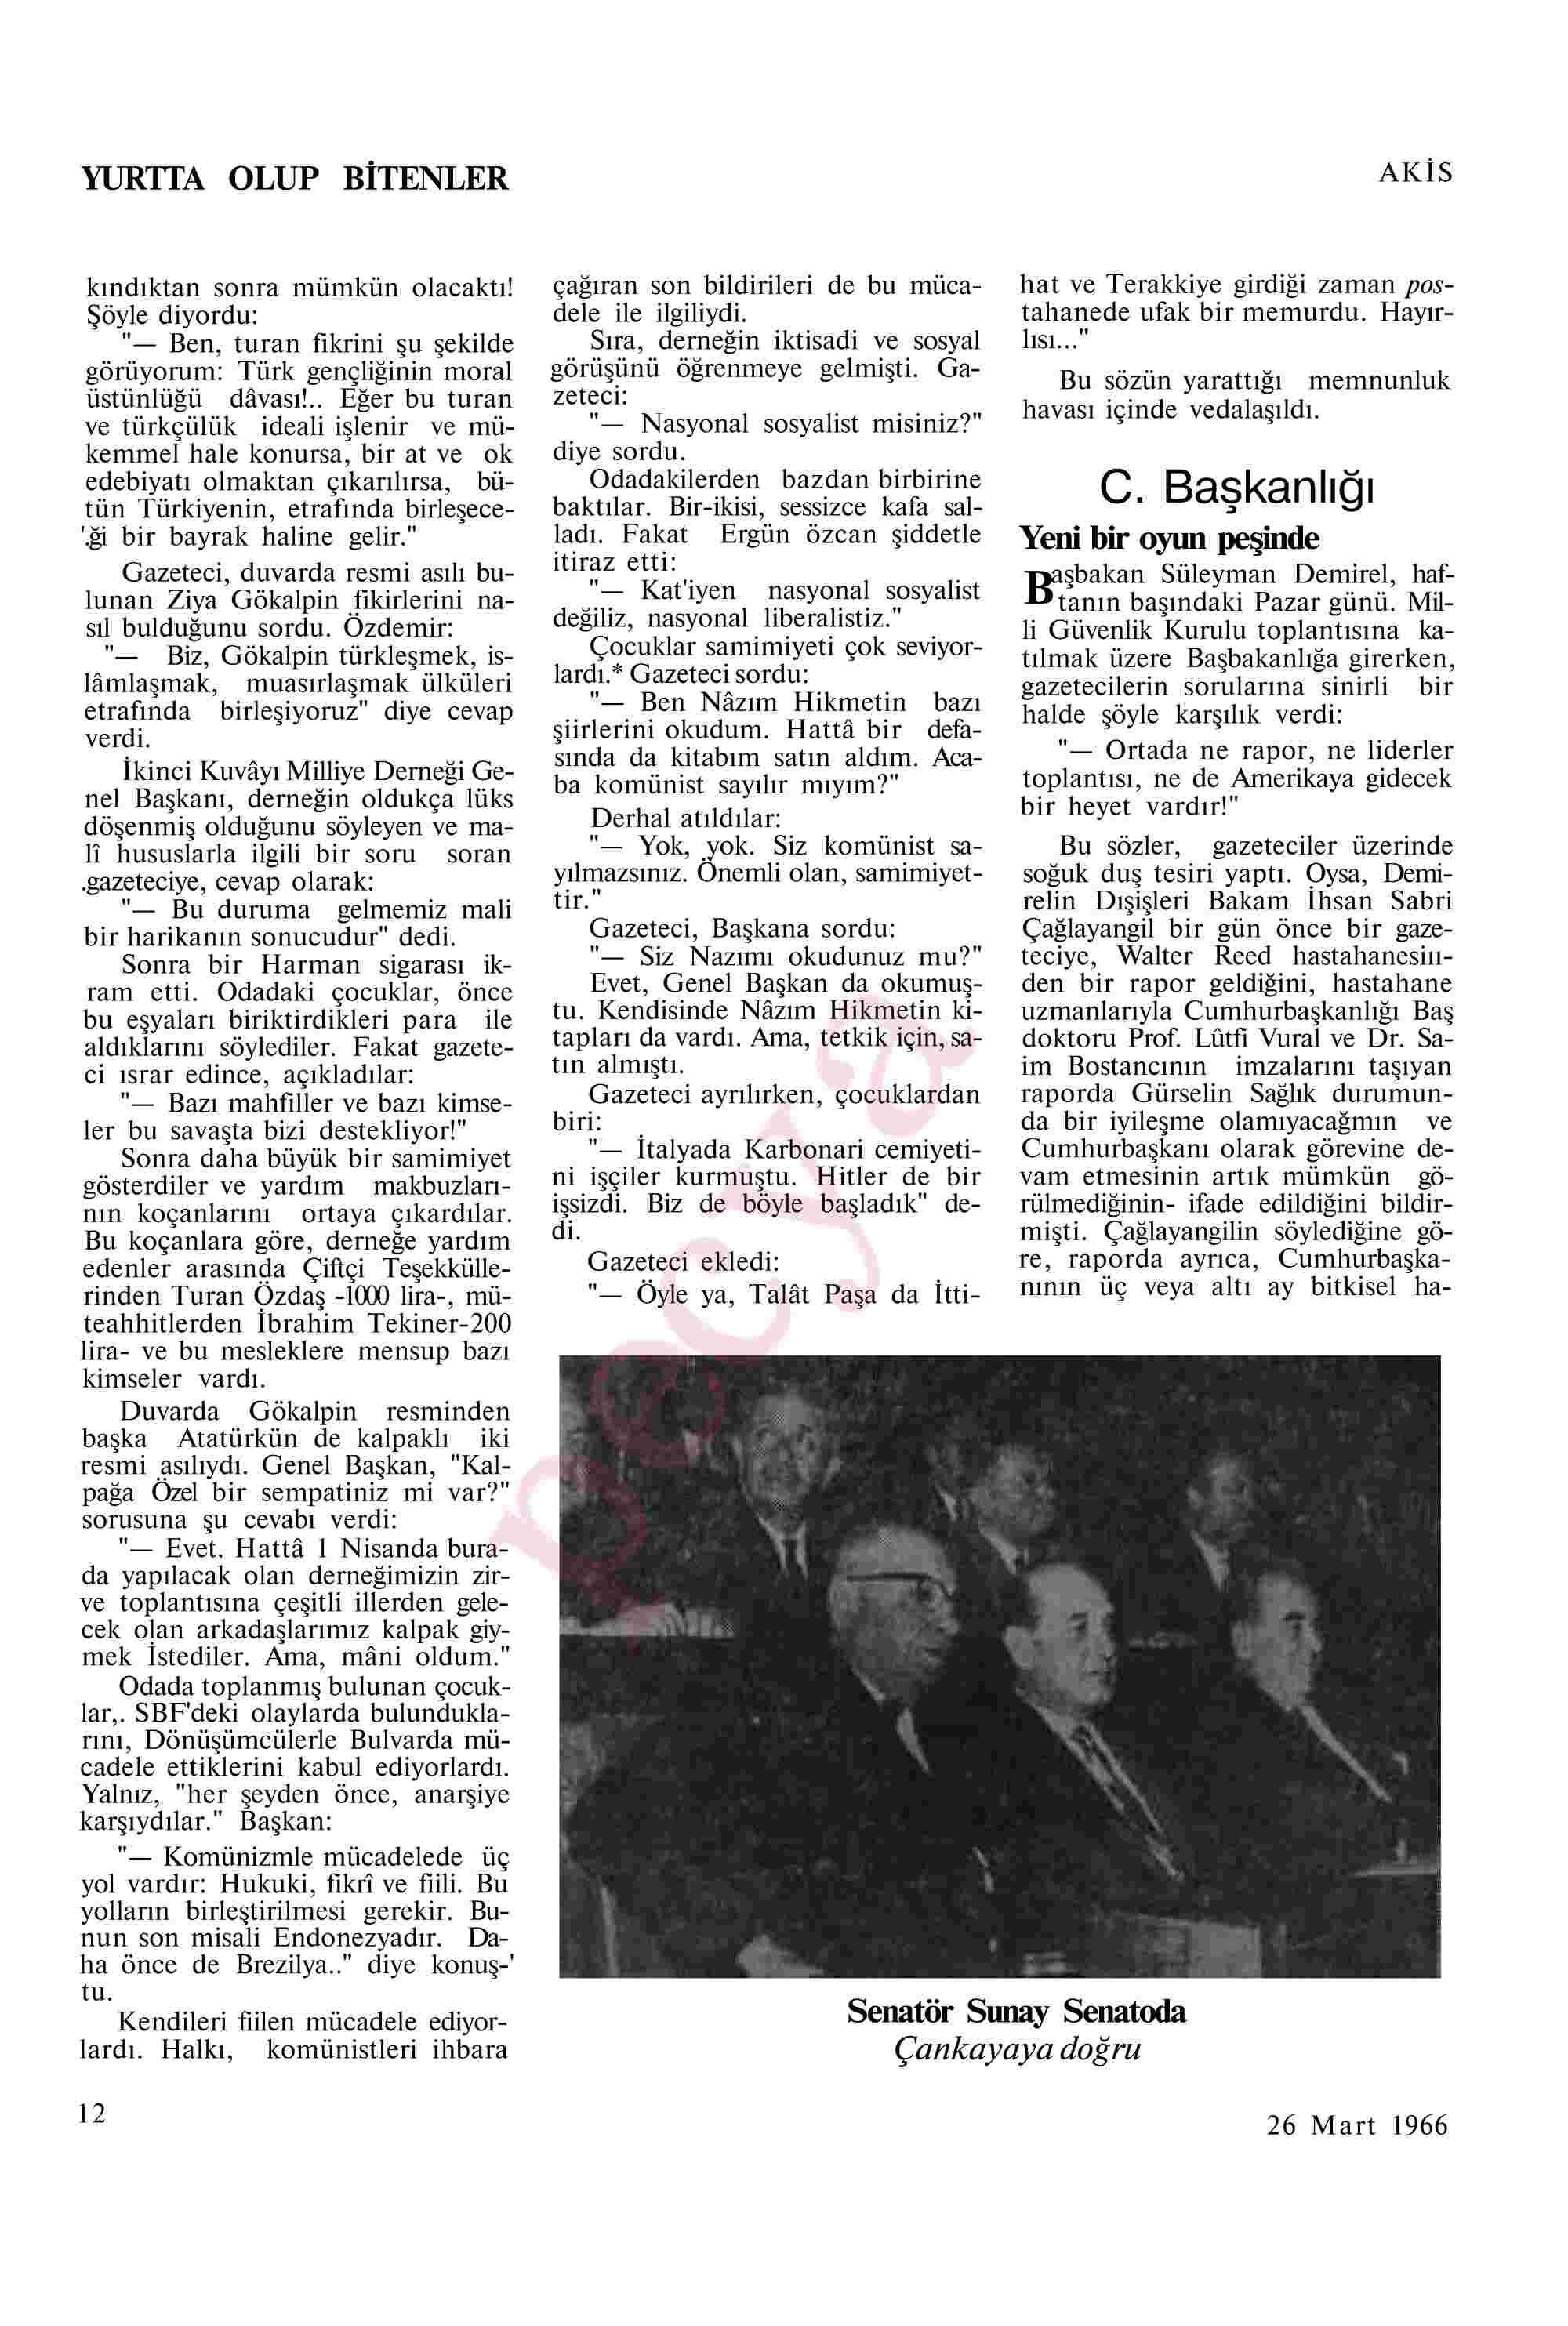 26 Mart 1966 tarihli Akis Dergisi Sayfa 12